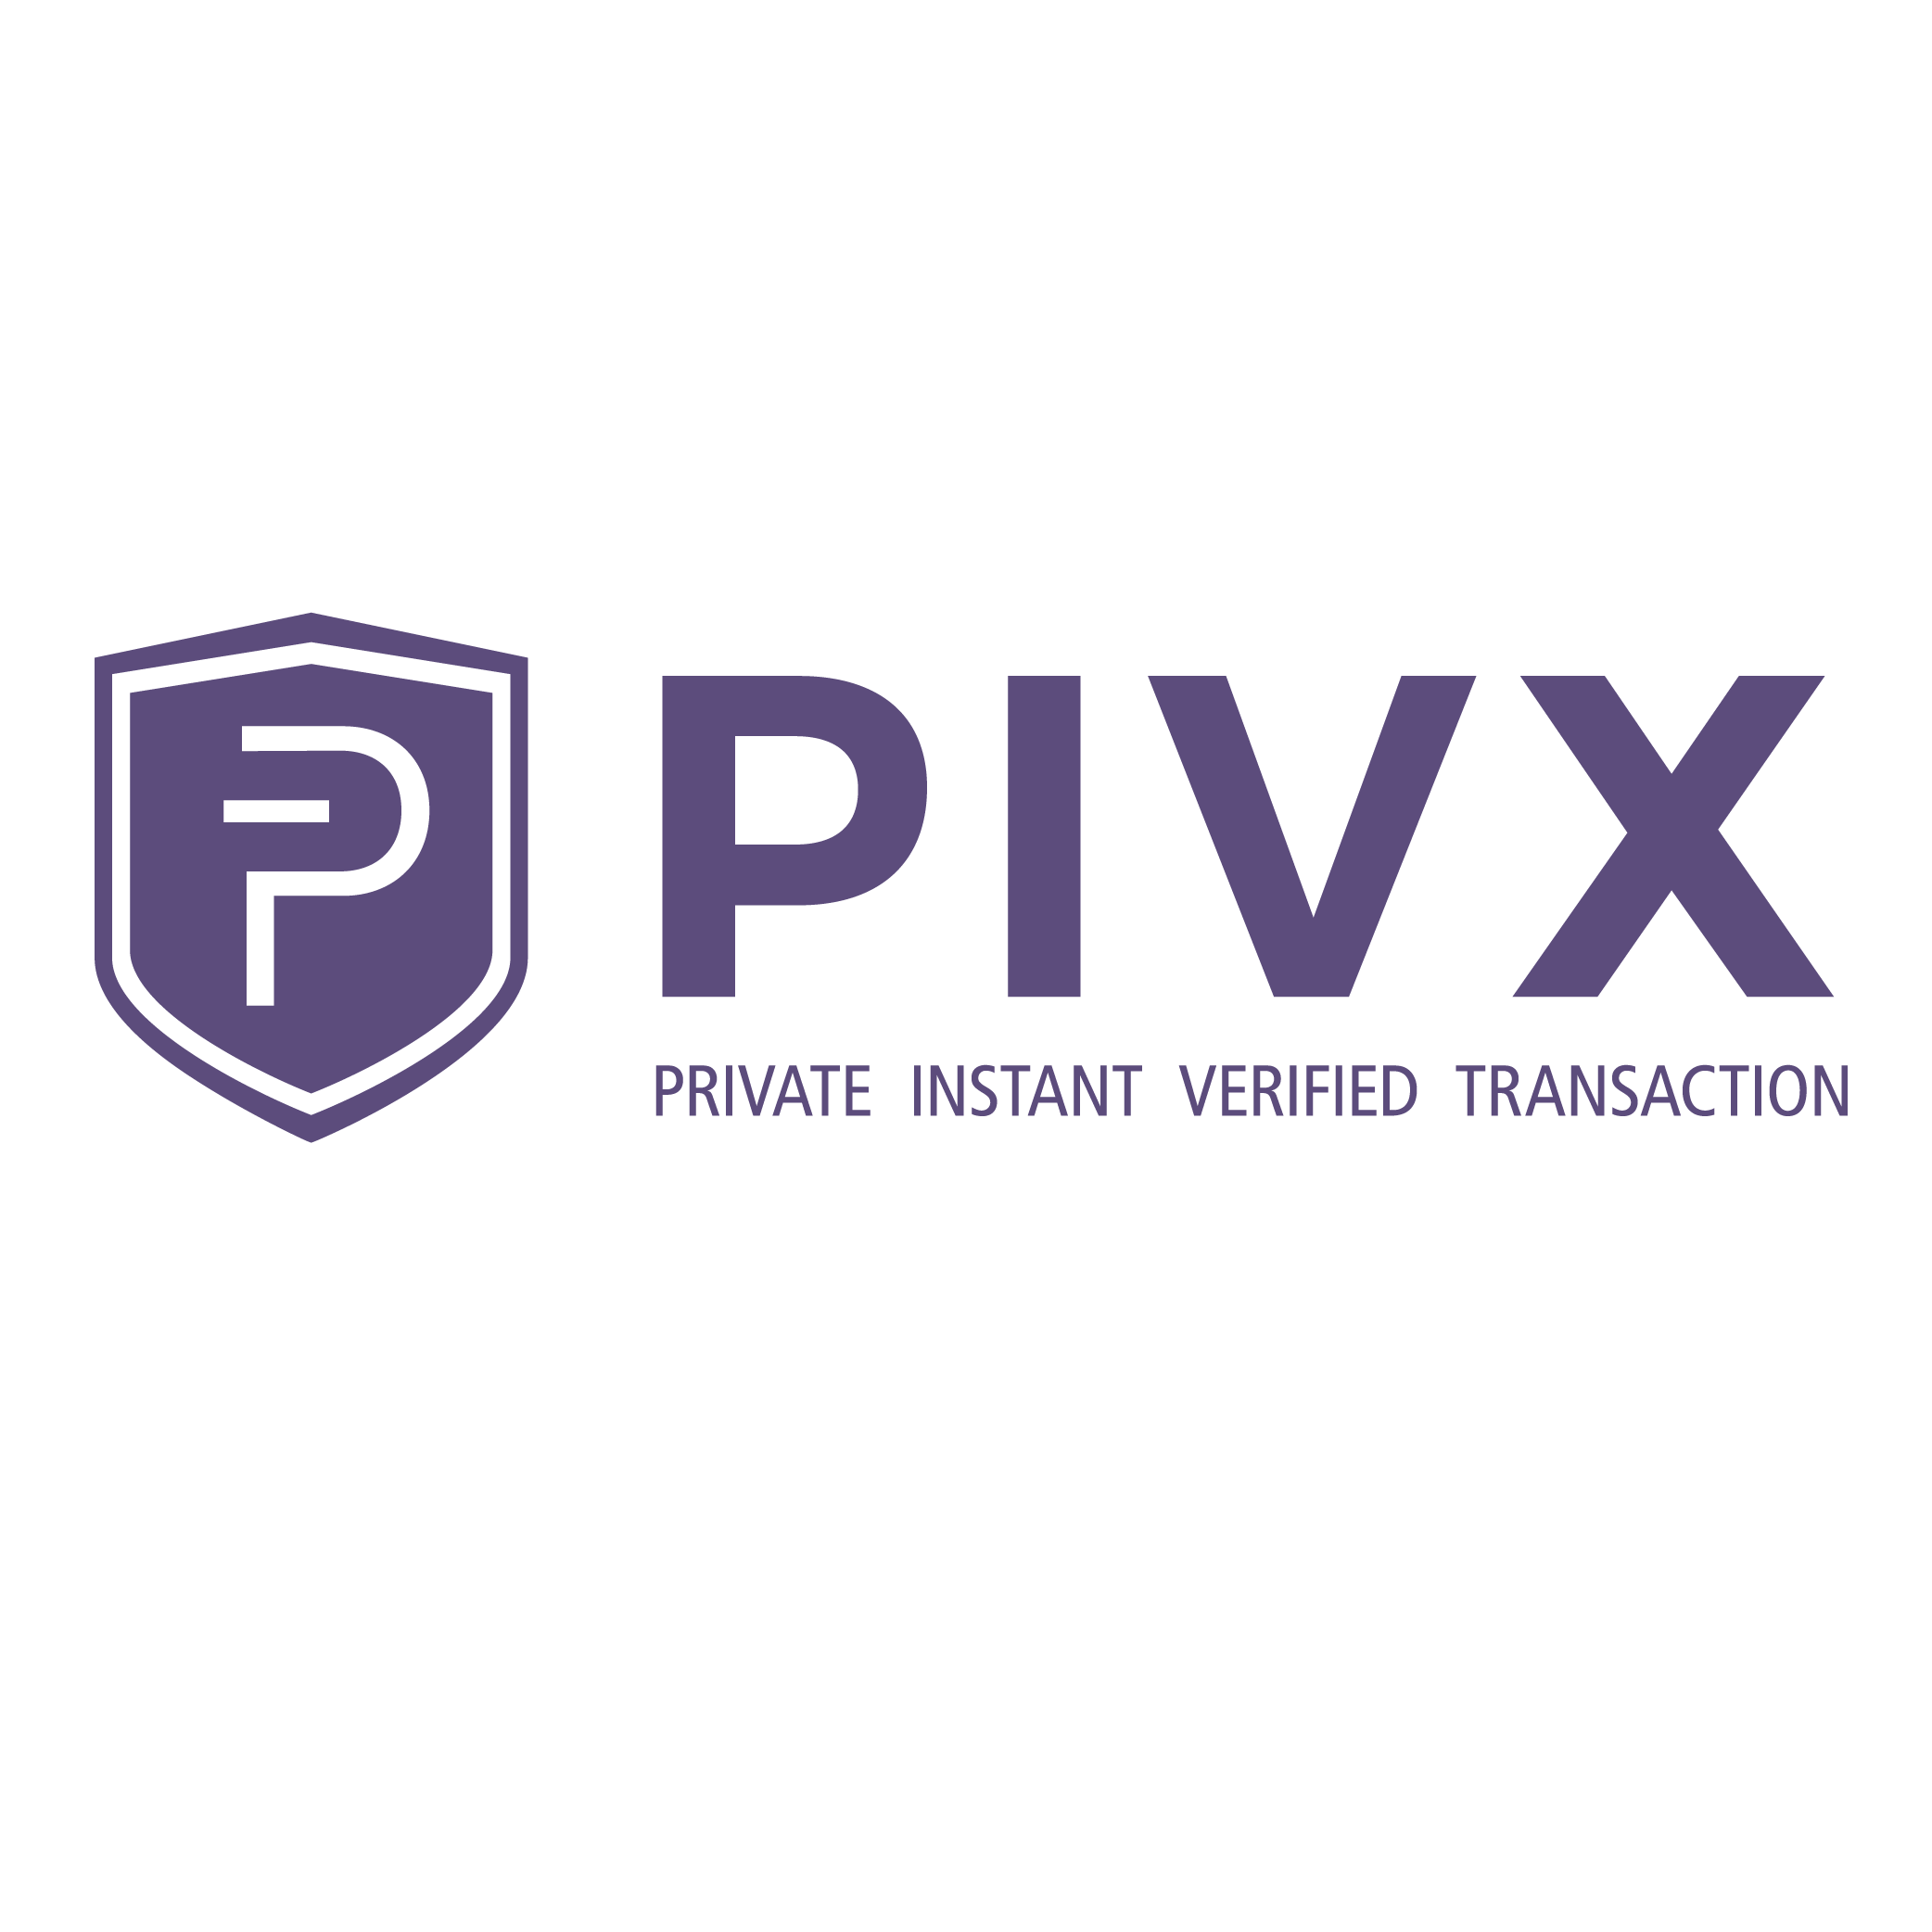 PIVX Anonymous Cryptocurrencies